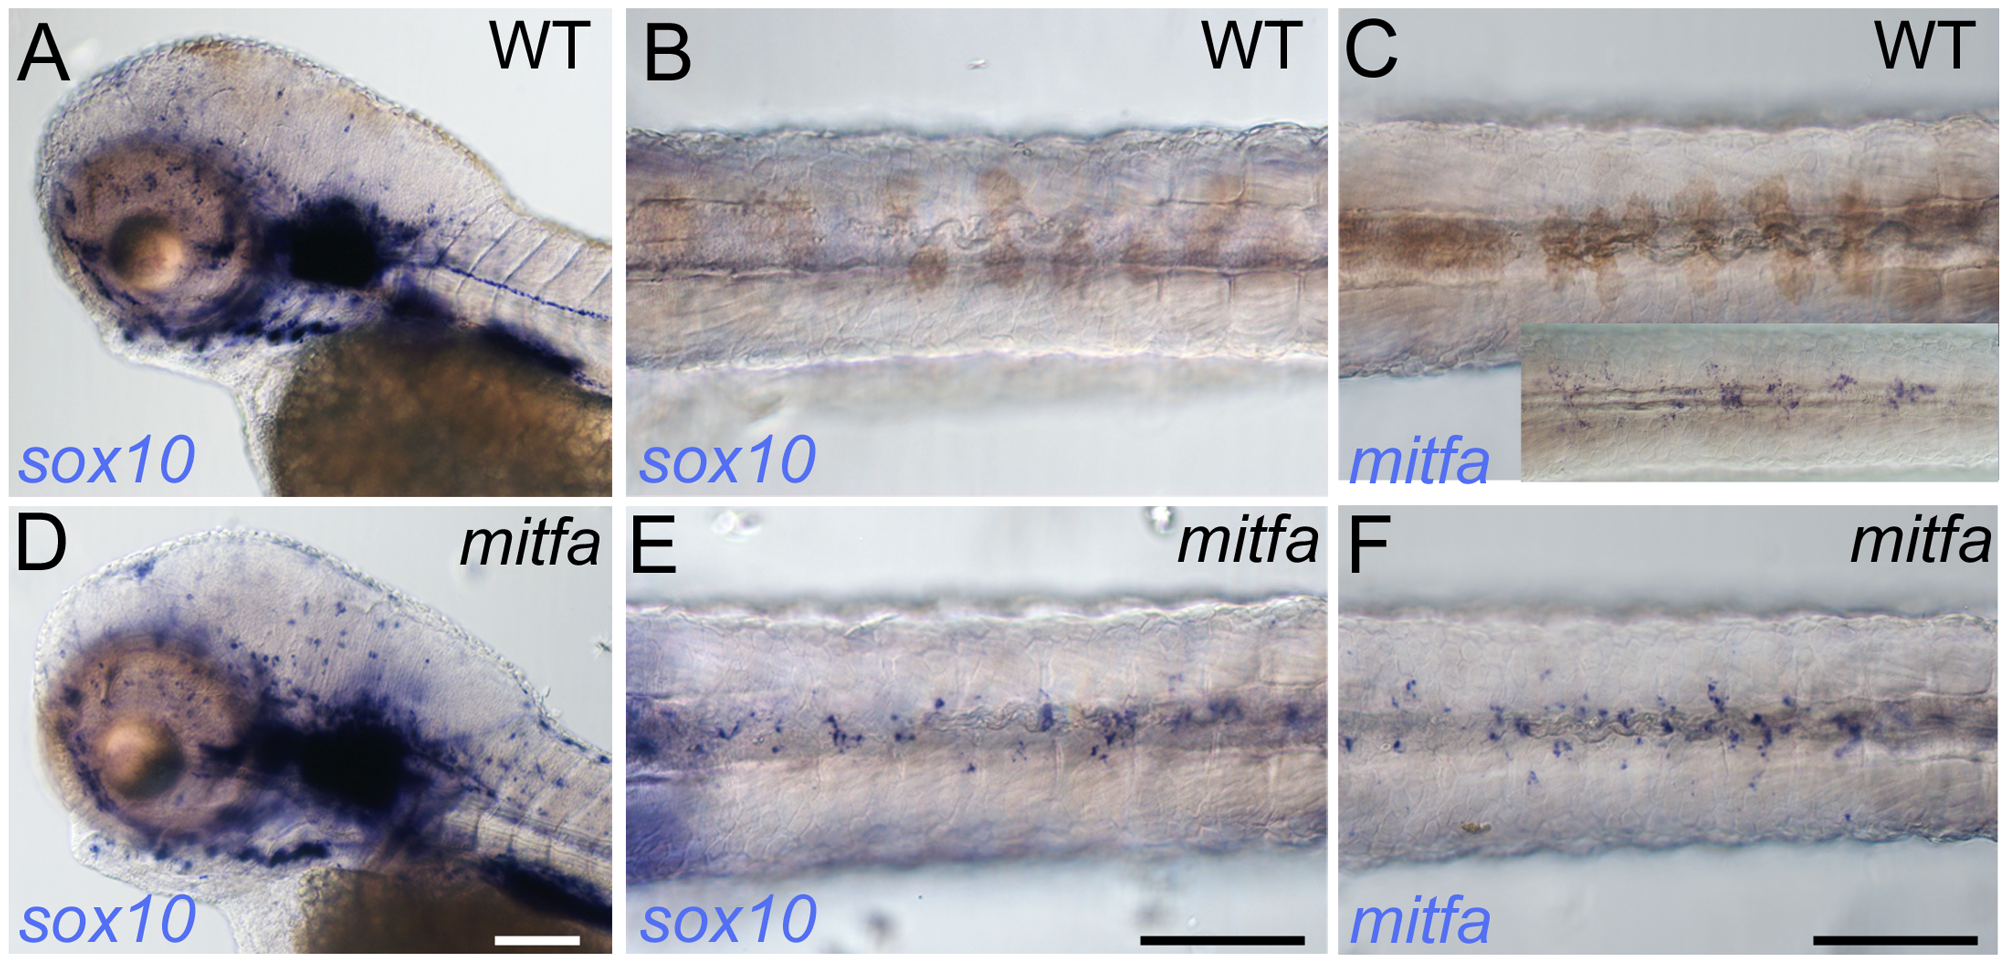 Mitfa-dependent repression of <i>sox10</i> expression in neural crest.